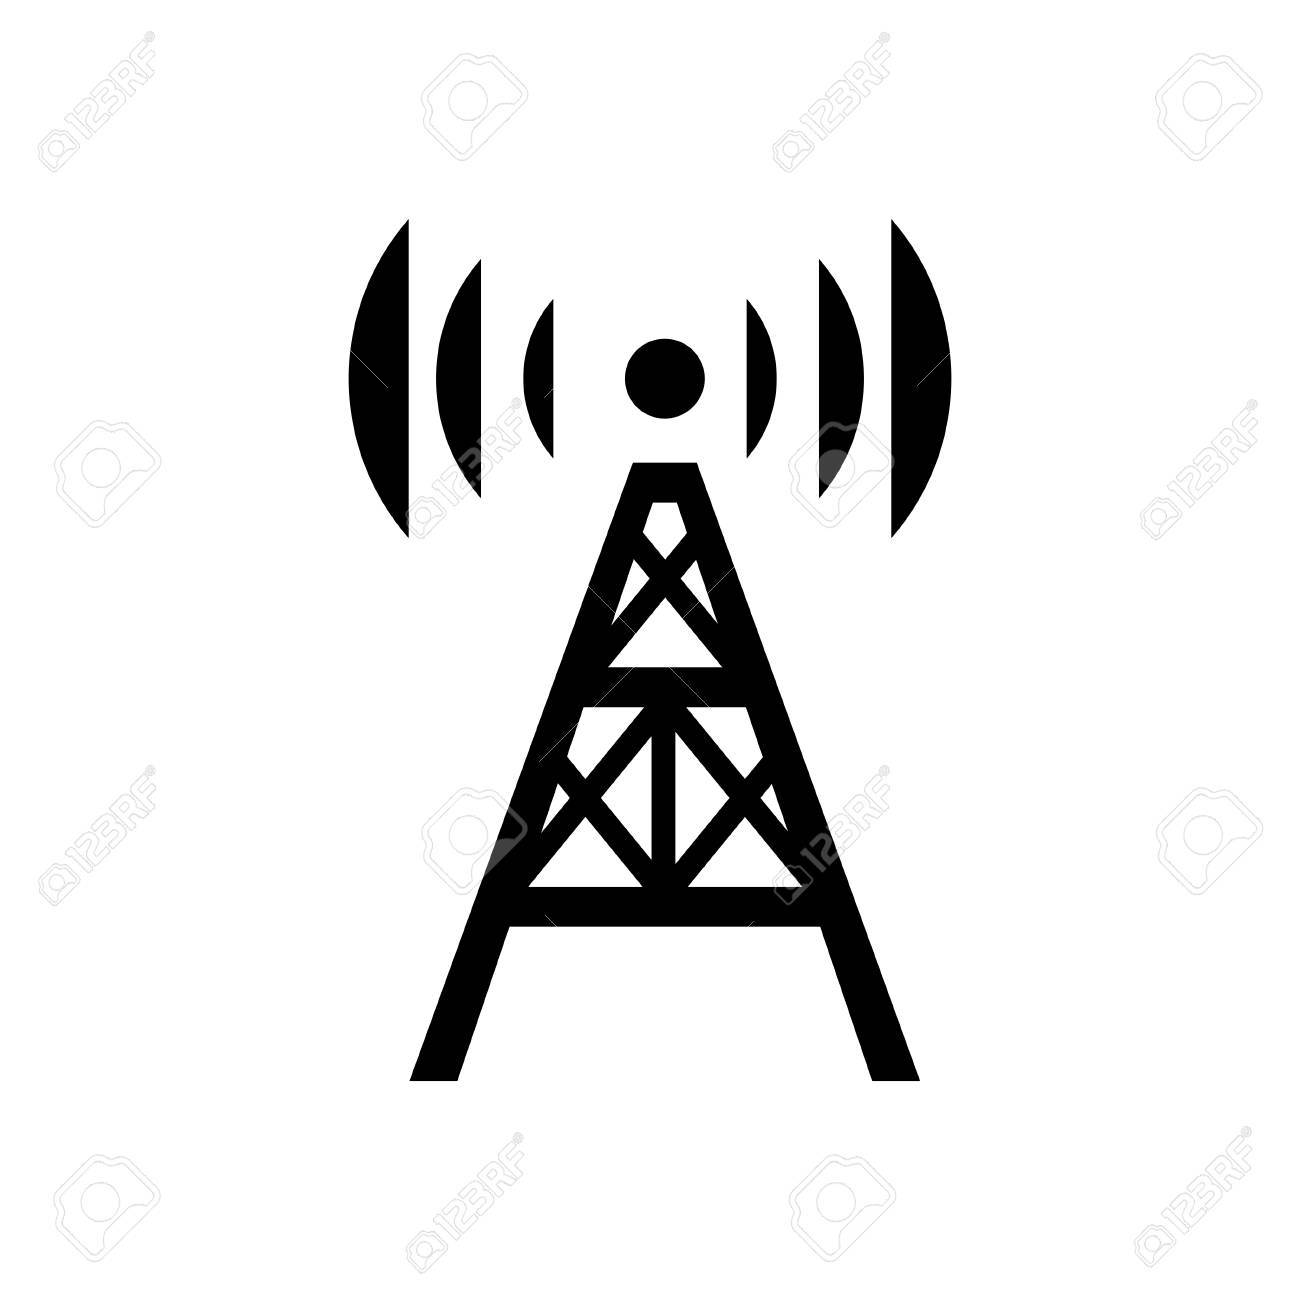 radio tower icon royalty free cliparts vectors and stock rh 123rf com Radio Antenna Clip Art Radio Signal Clip Art